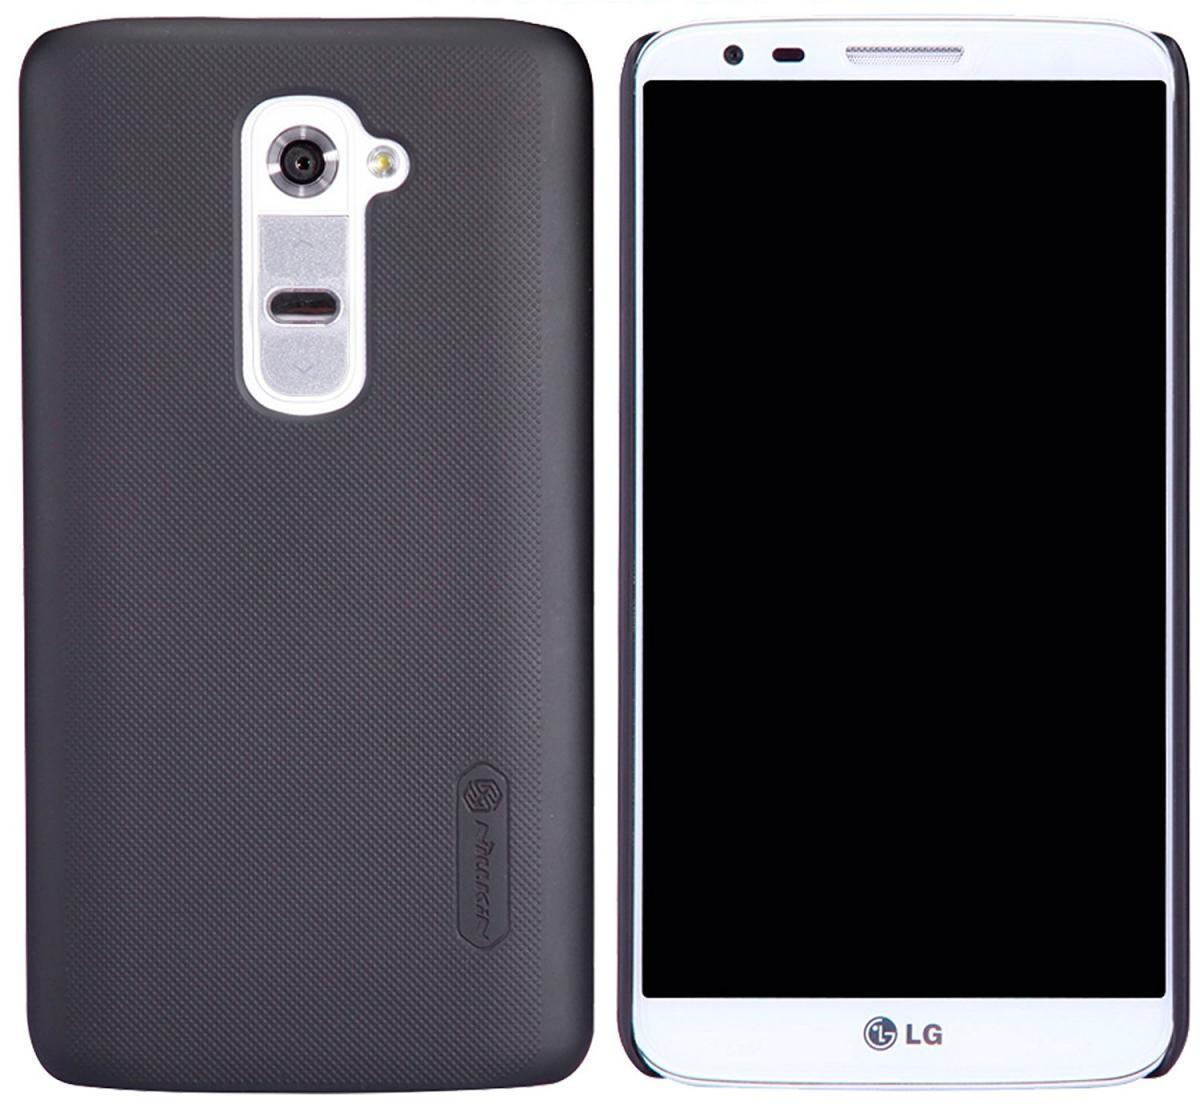 Чехол-накладка Nillkin Frosted Shield для LG G2 D802 (пластиковый) Blackдля LG<br>Чехол-накладка Nillkin Frosted Shield для LG G2 D802 (пластиковый) Black<br>